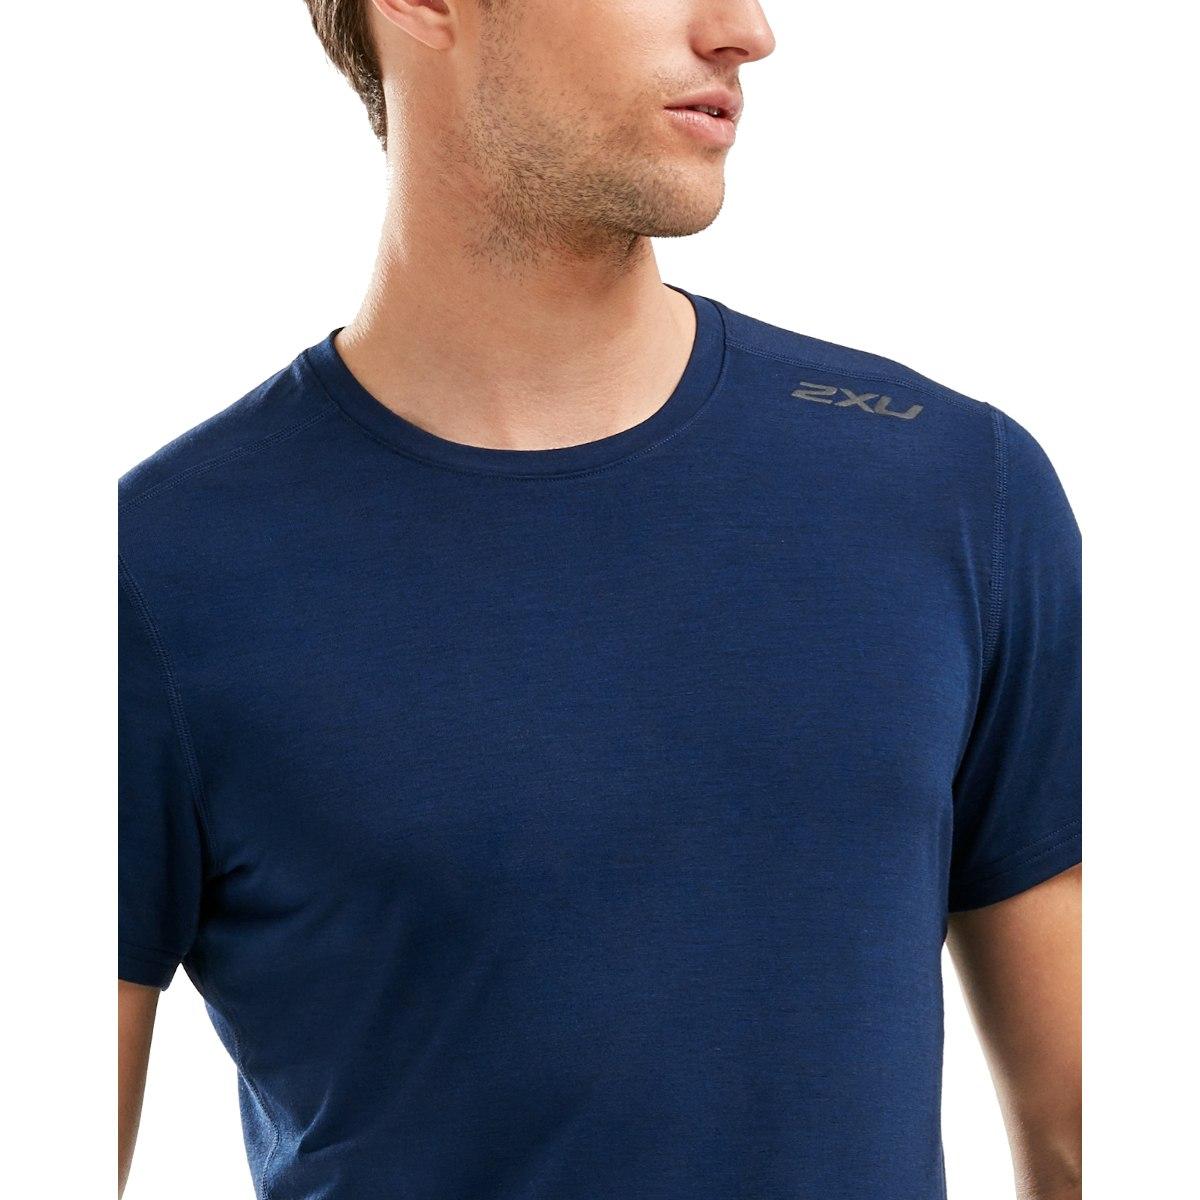 Imagen de 2XU Heat Short Sleeve Tee - navy marle/navy marle